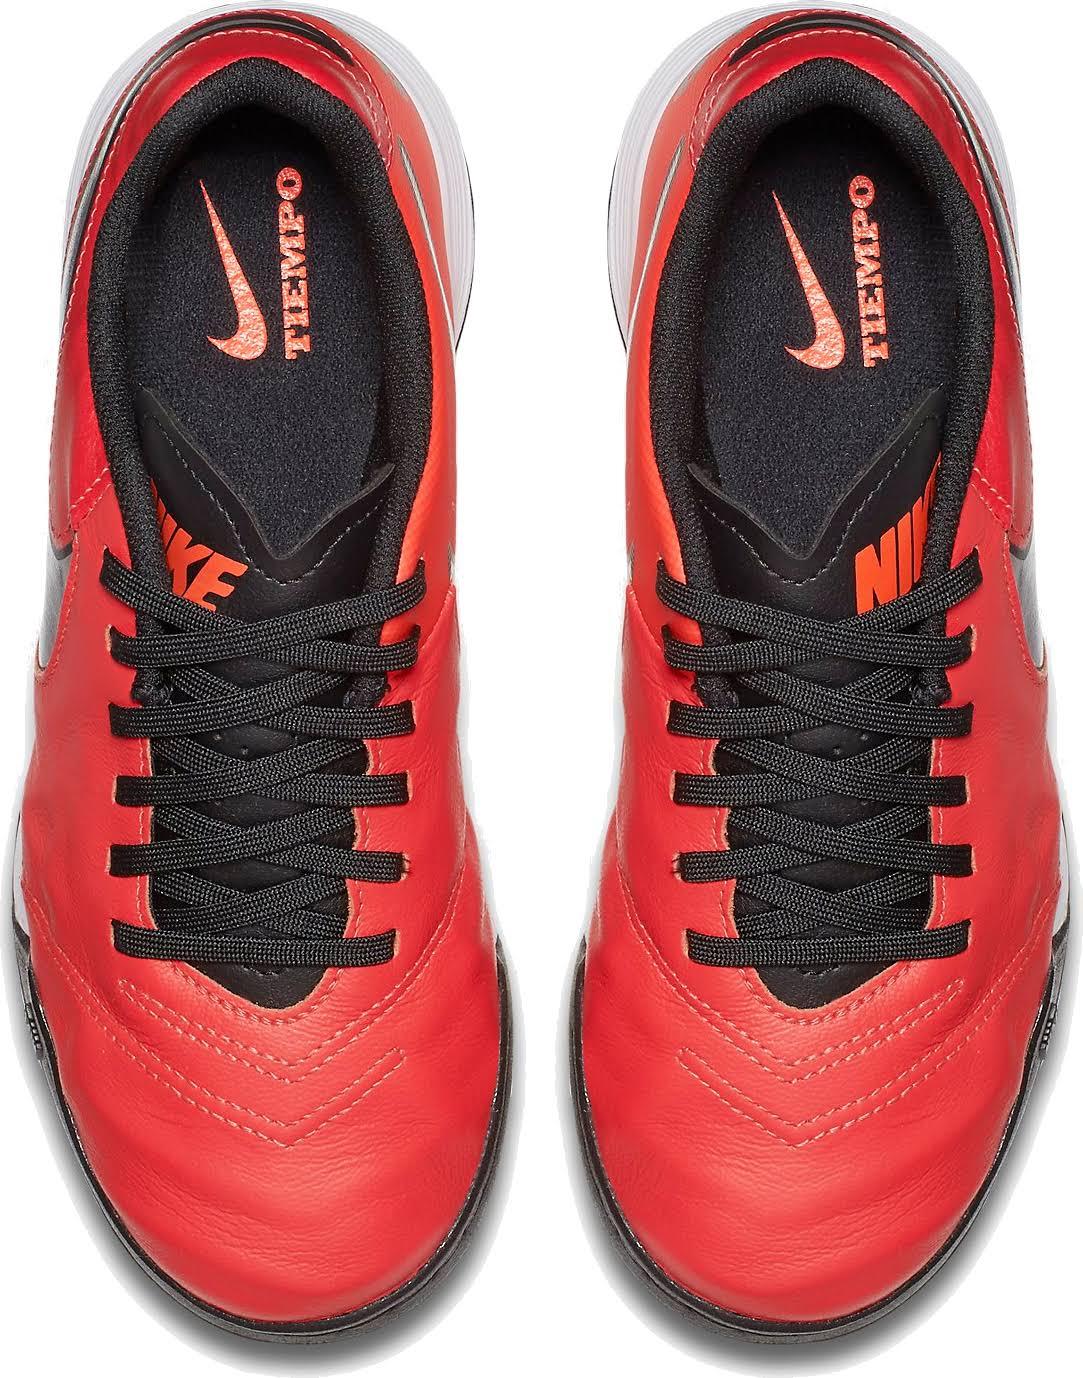 Astro Nike Turf Legend Red Football Trainers Junior Tiempo Vi qPRPwnxHtr